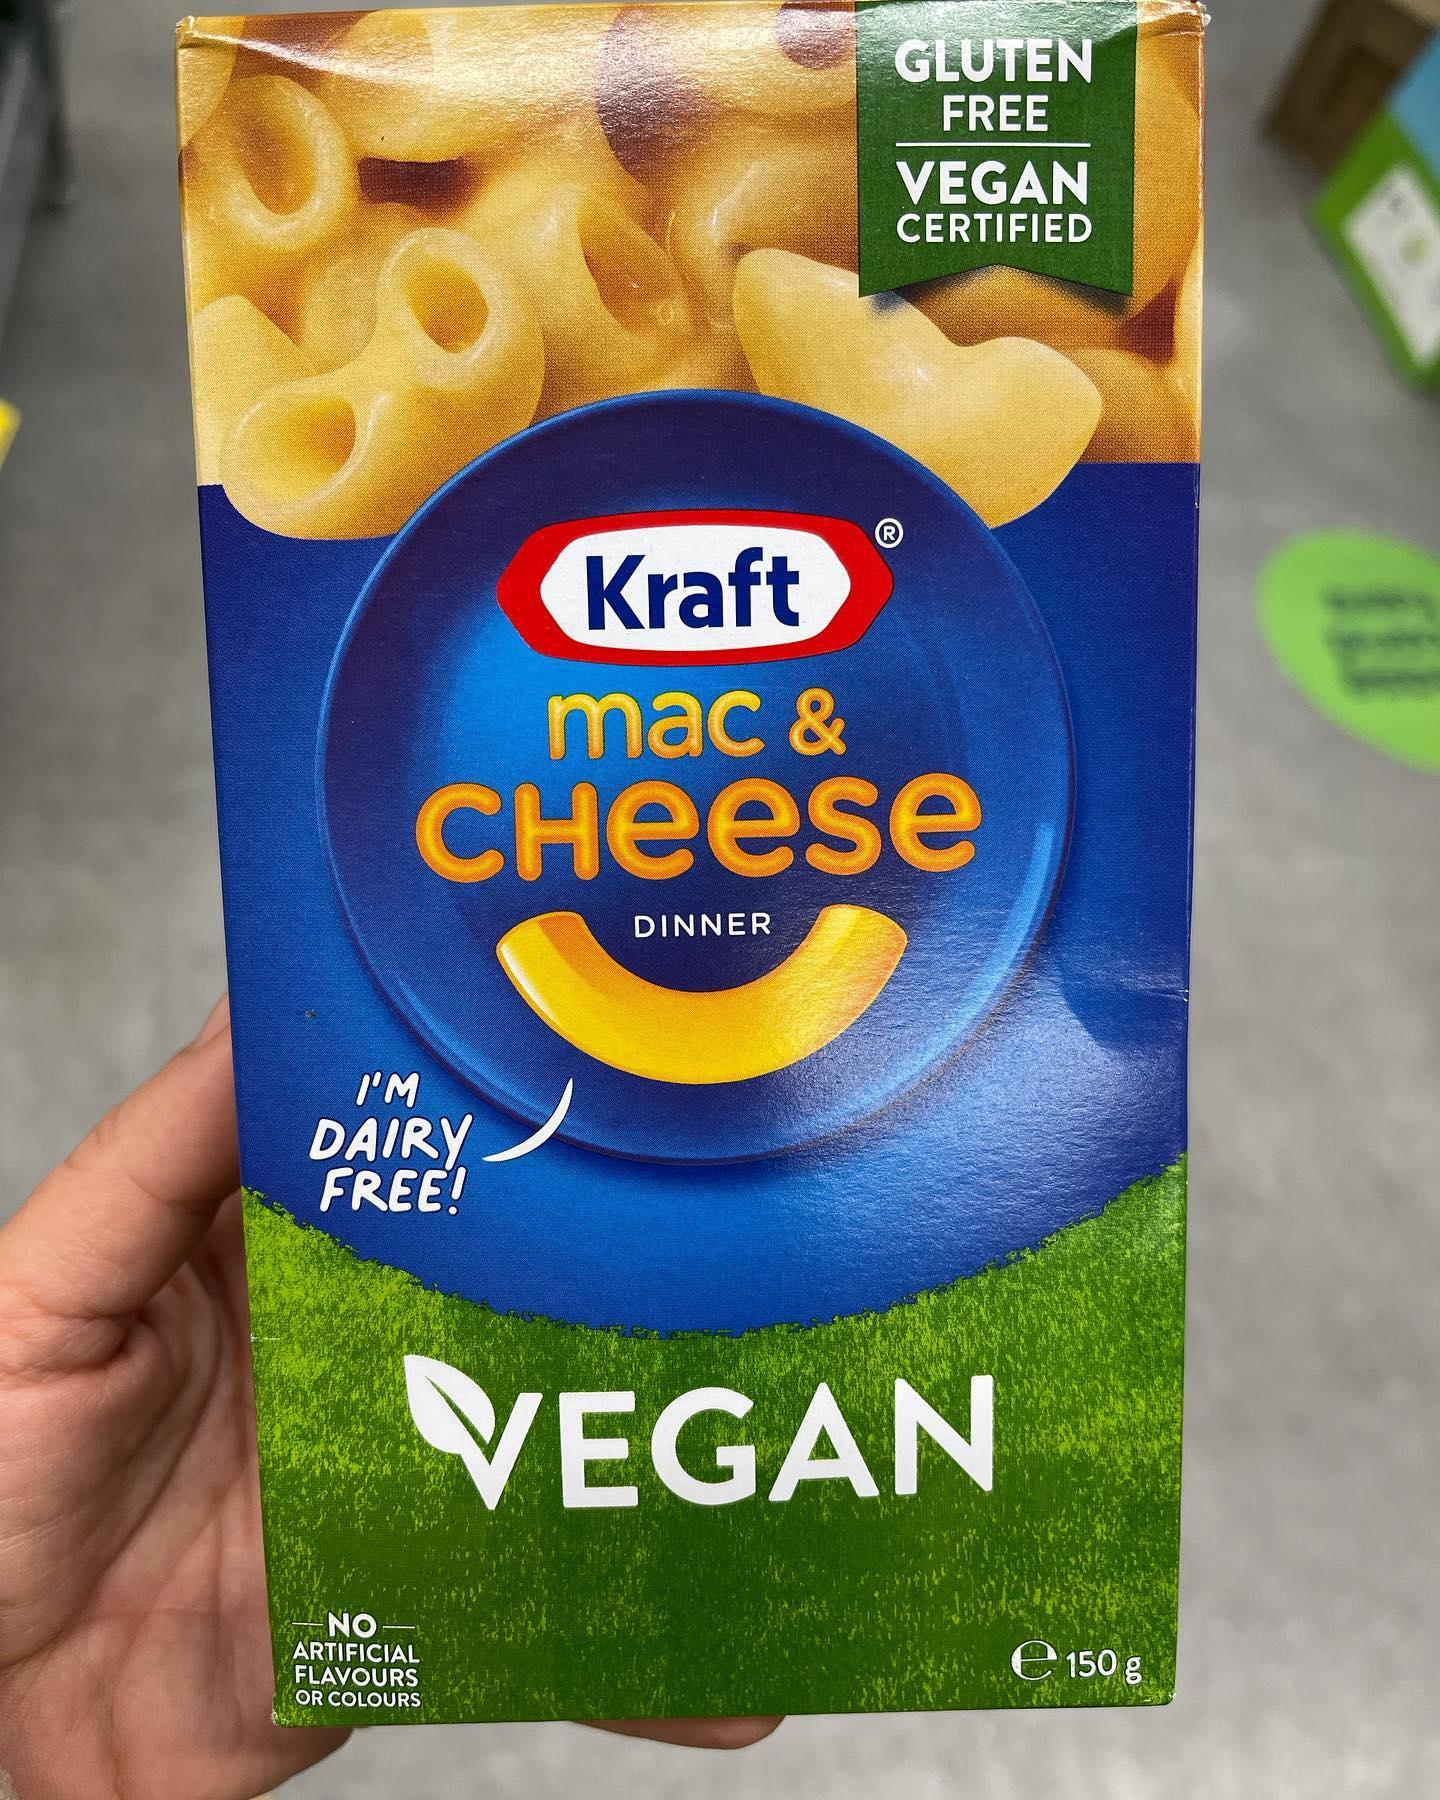 Kraft launches vegan mac & cheese across Australia